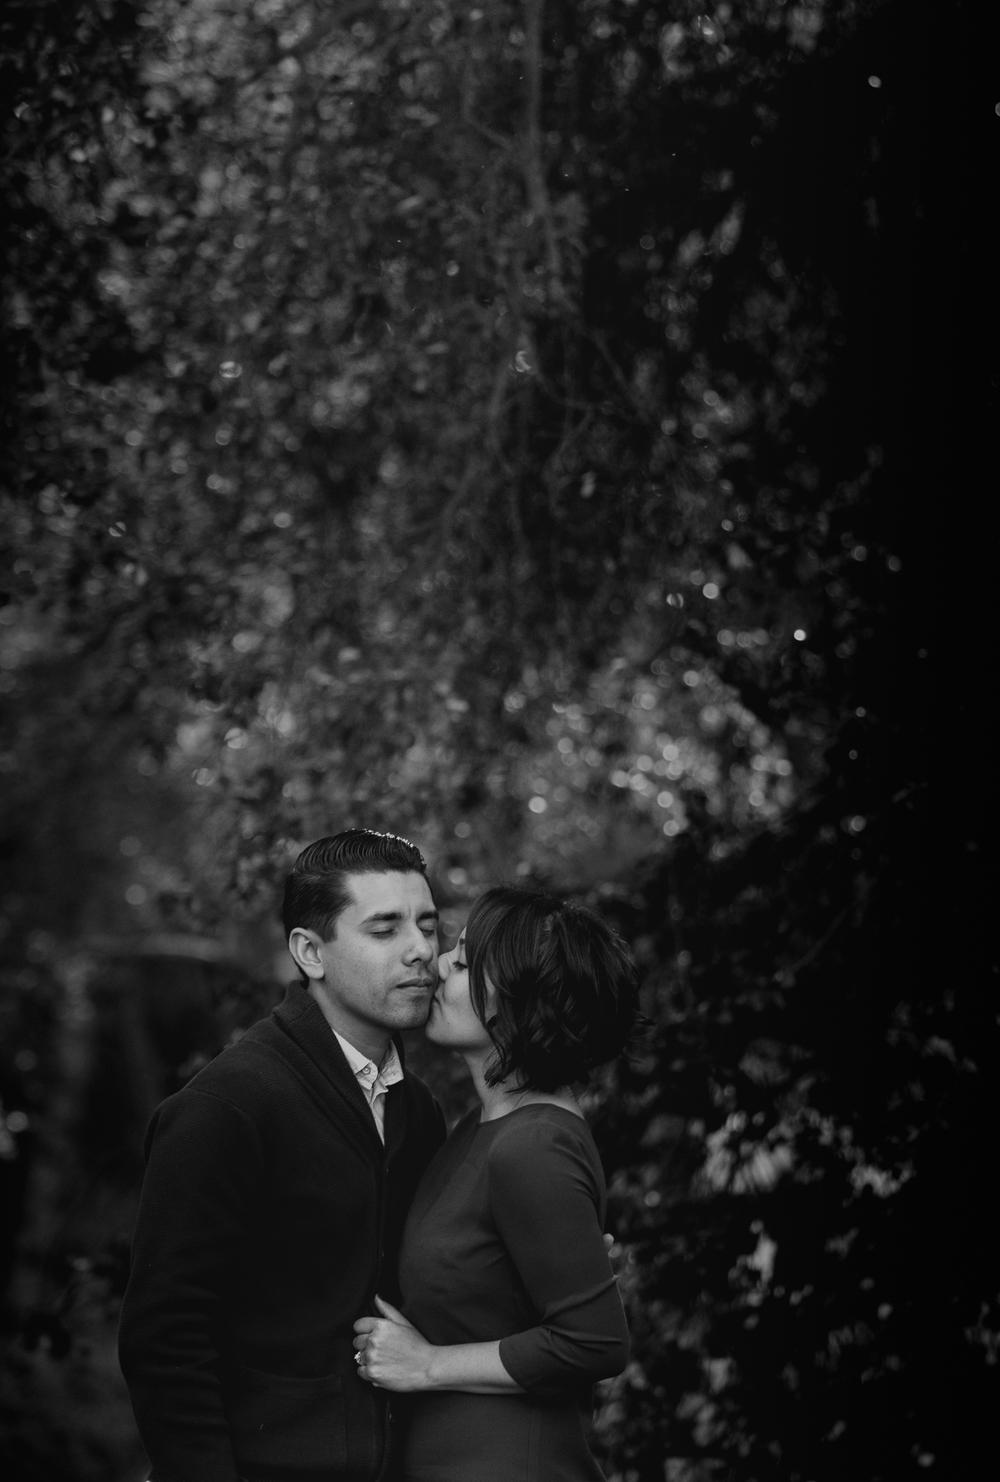 IMG_2451_Melissa-Phelan-Christian-Wedding-Photographer-Engagement-Elopement-Adventure-Love-Explore-Documenting.jpg